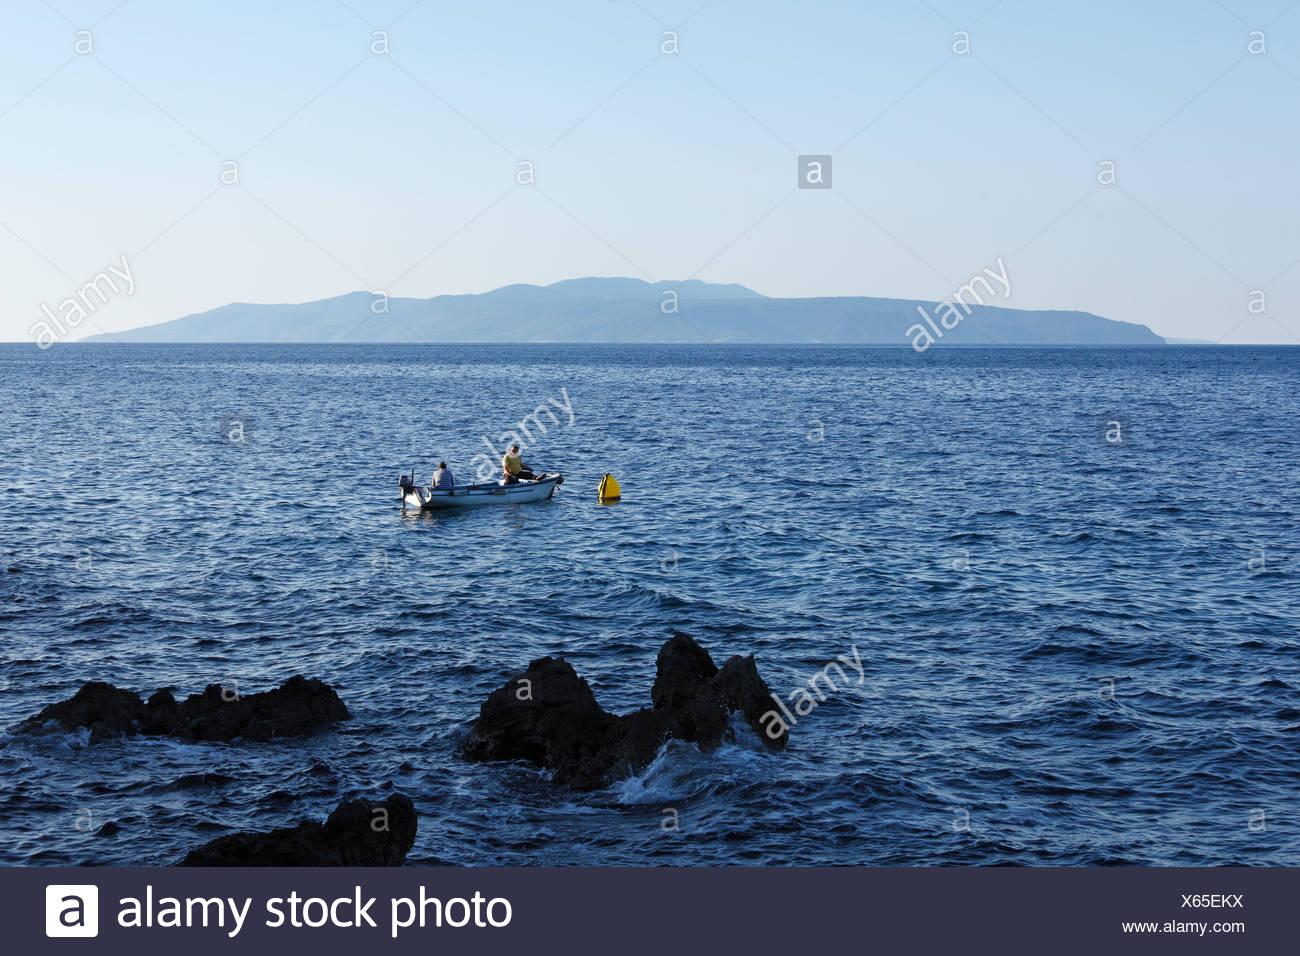 Fishermen in a boat, Cres Island, view from Ika, Istria, Kvarner Gulf, Croatia, Europe Stock Photo